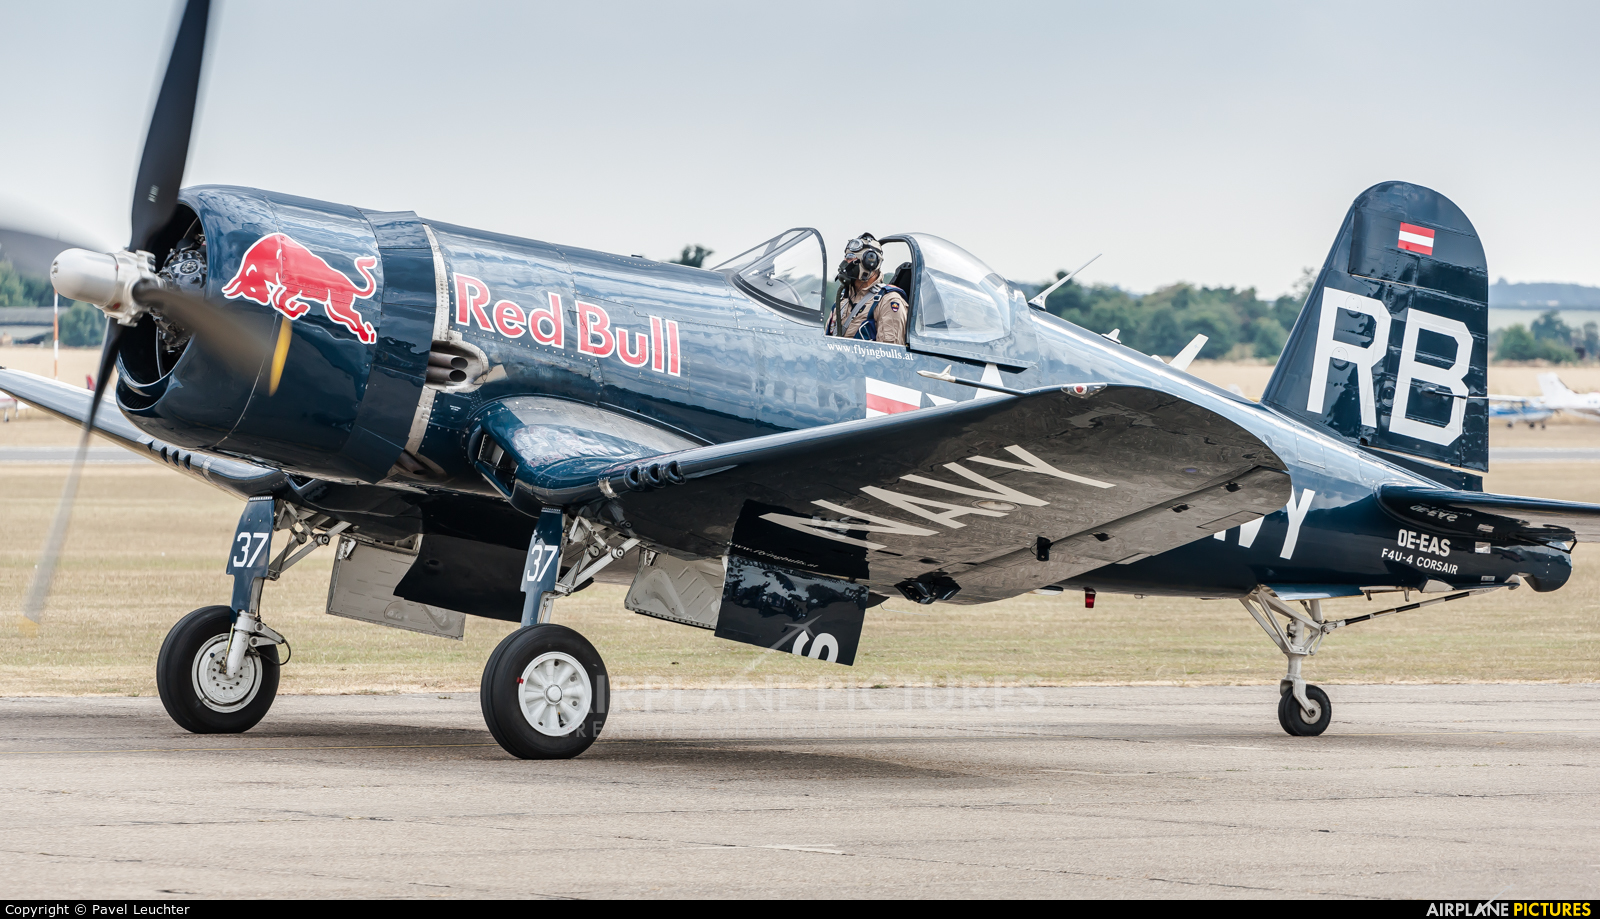 Red Bull OE-EAS aircraft at Duxford